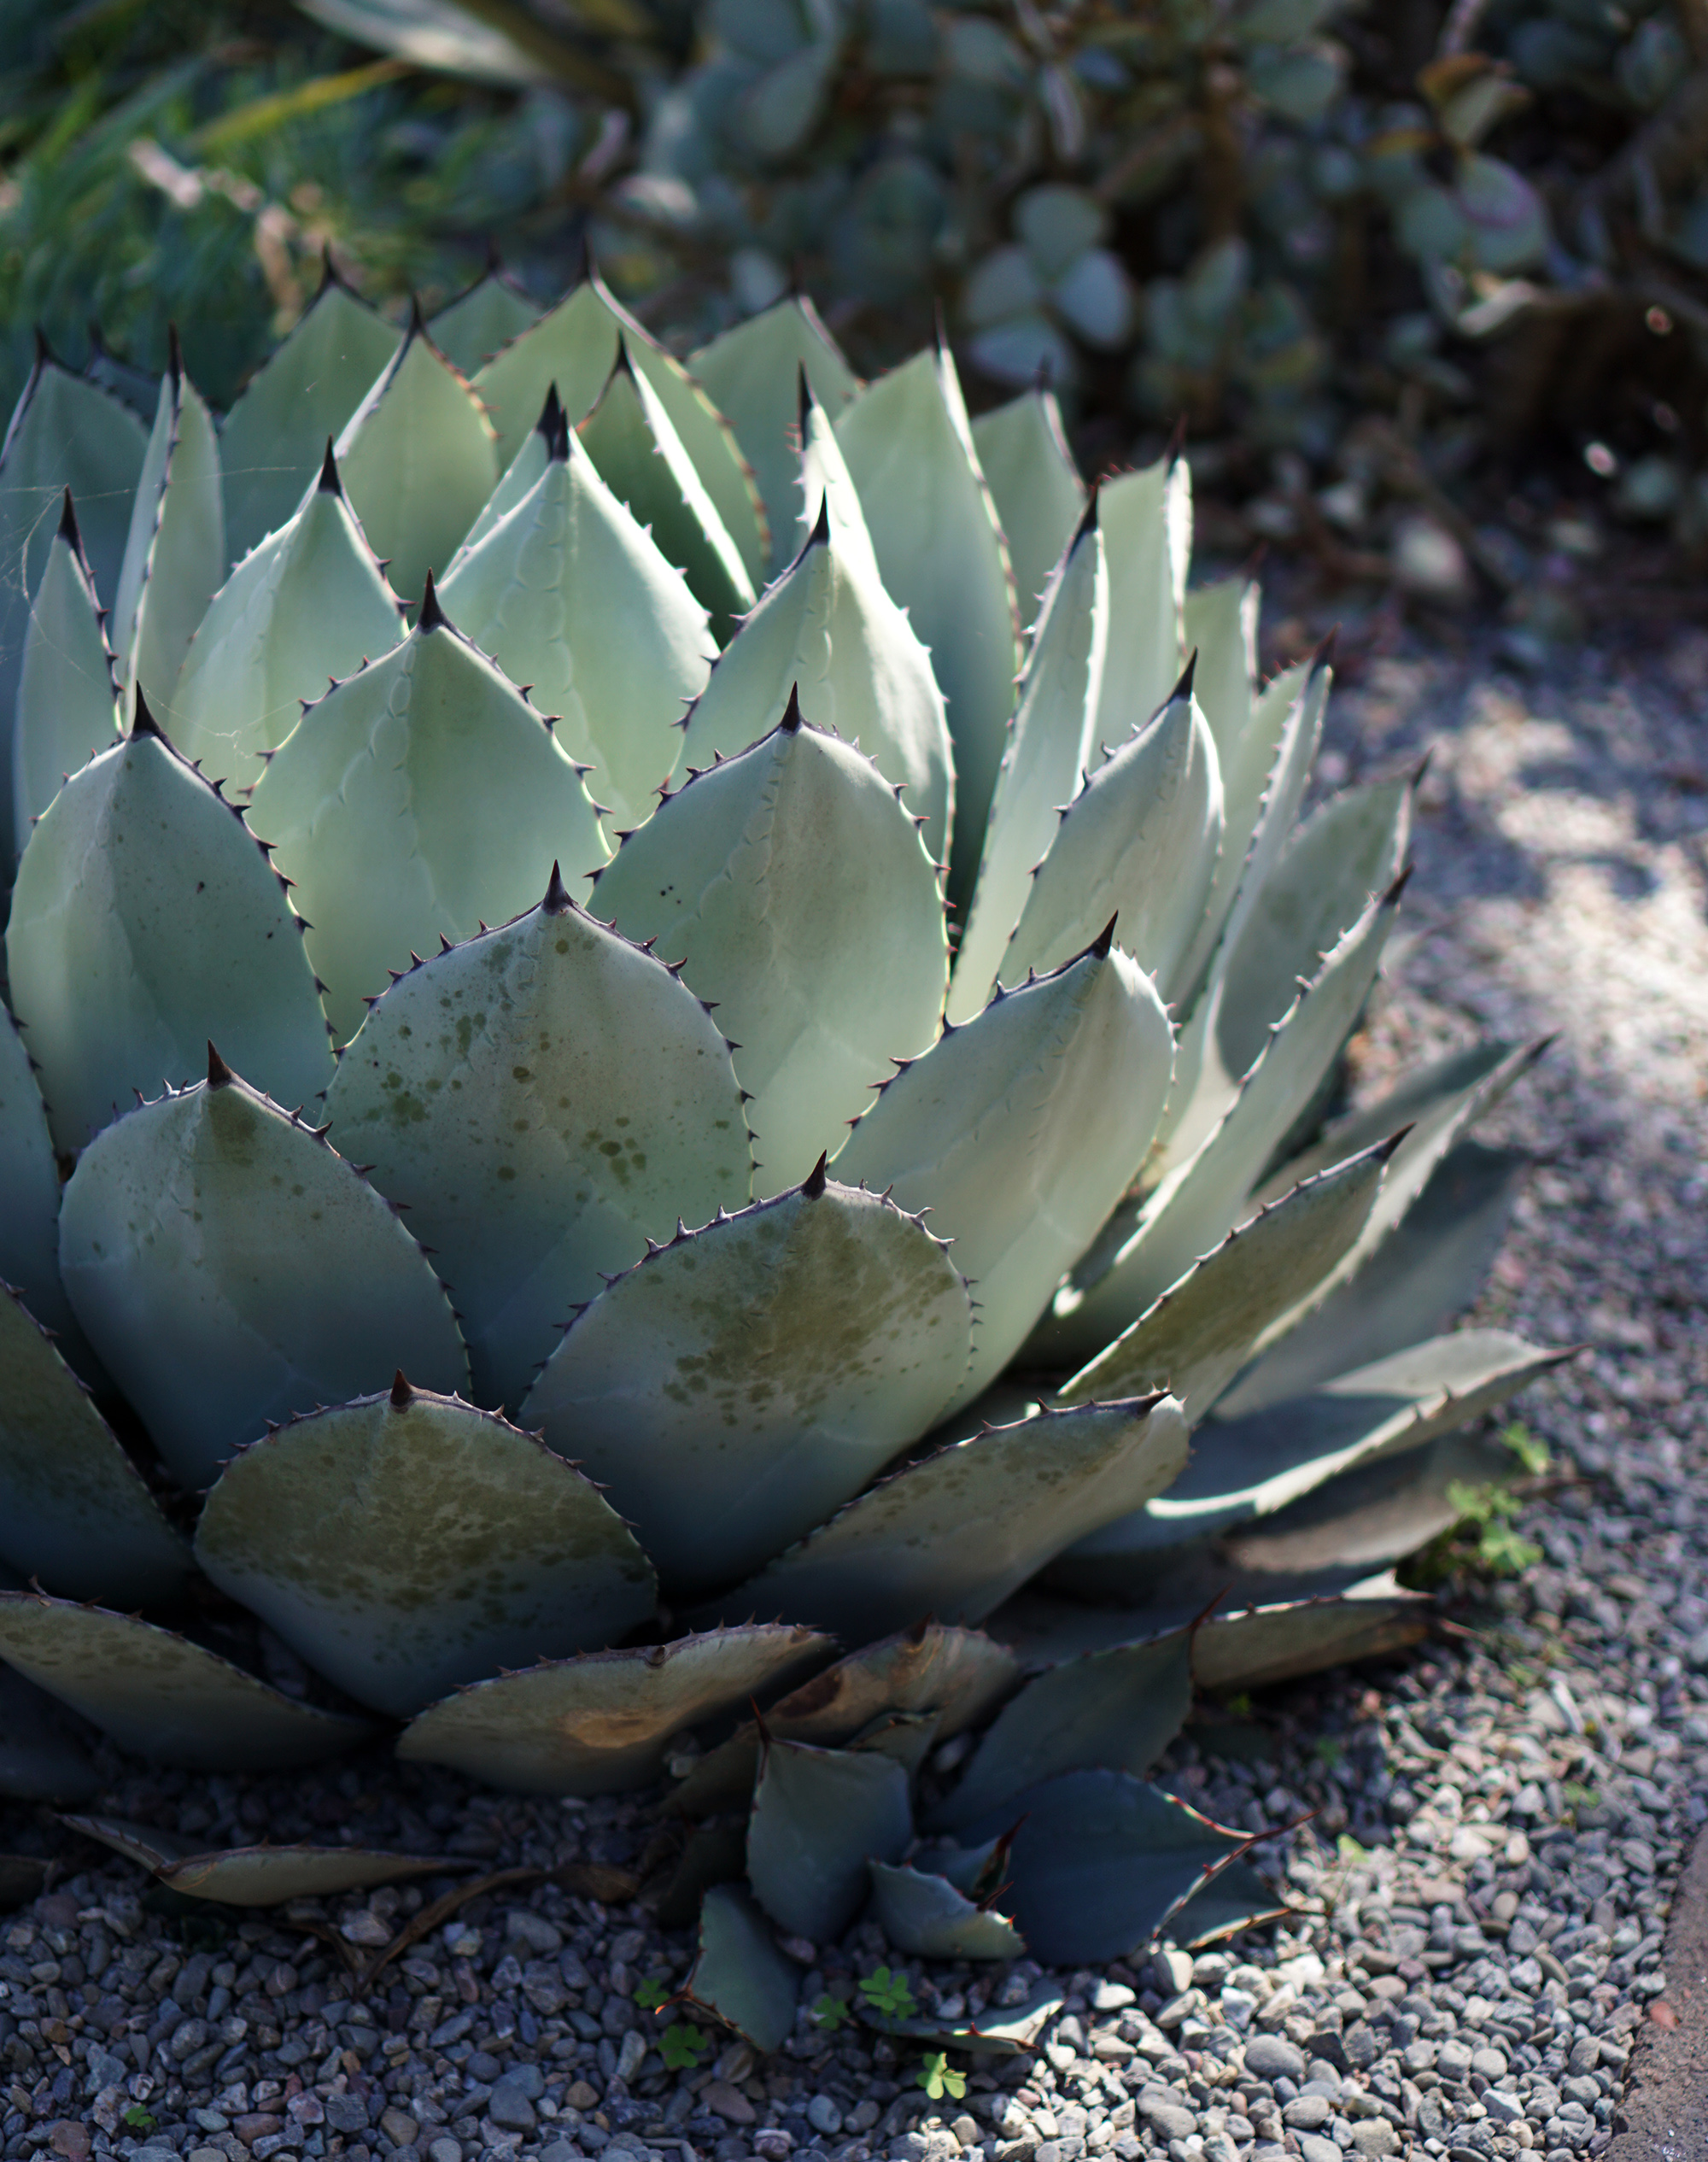 Agave at the Gardens at Lake Merritt, Oakland California / Darker than Green